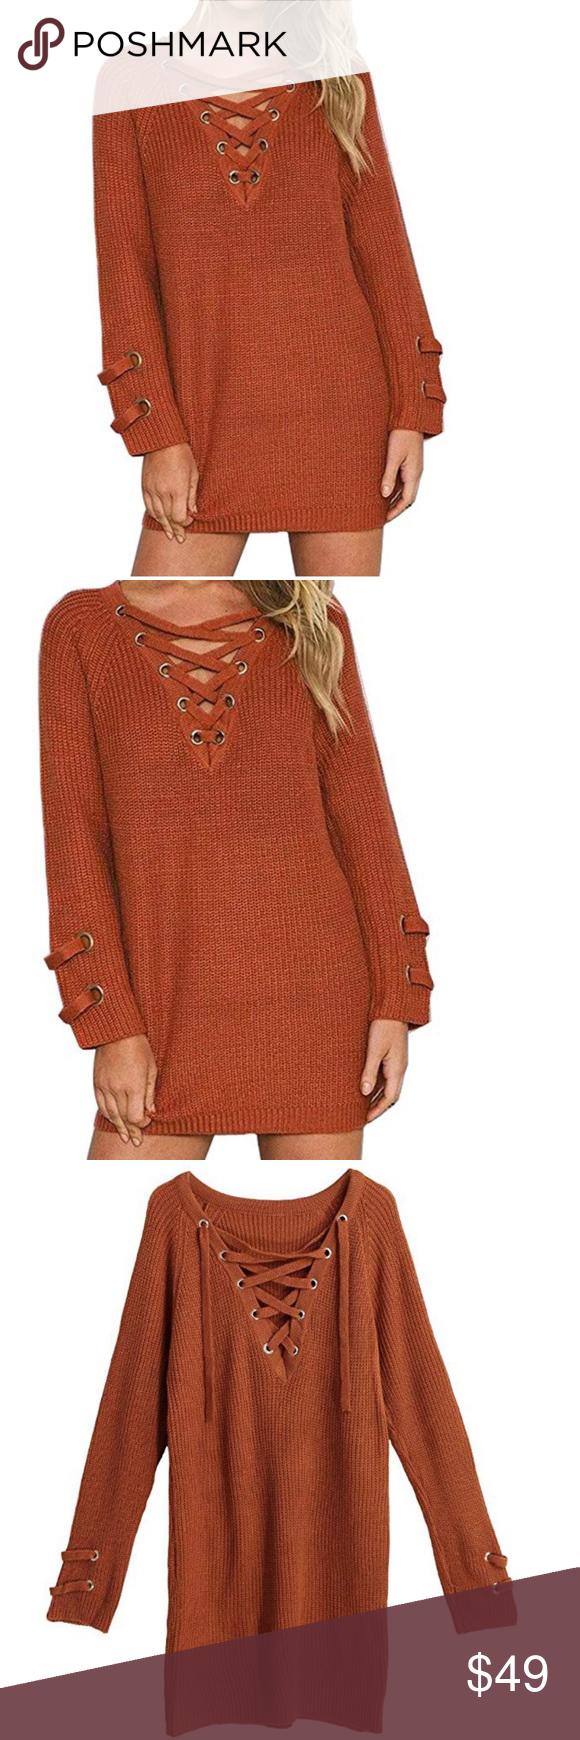 29778ebb0bfa women lace up knit sweater mini dress top Beautiful women lace up long  sleeve knit sweater top mini dress color brick red material 80% acrylic 20%  cotton ...